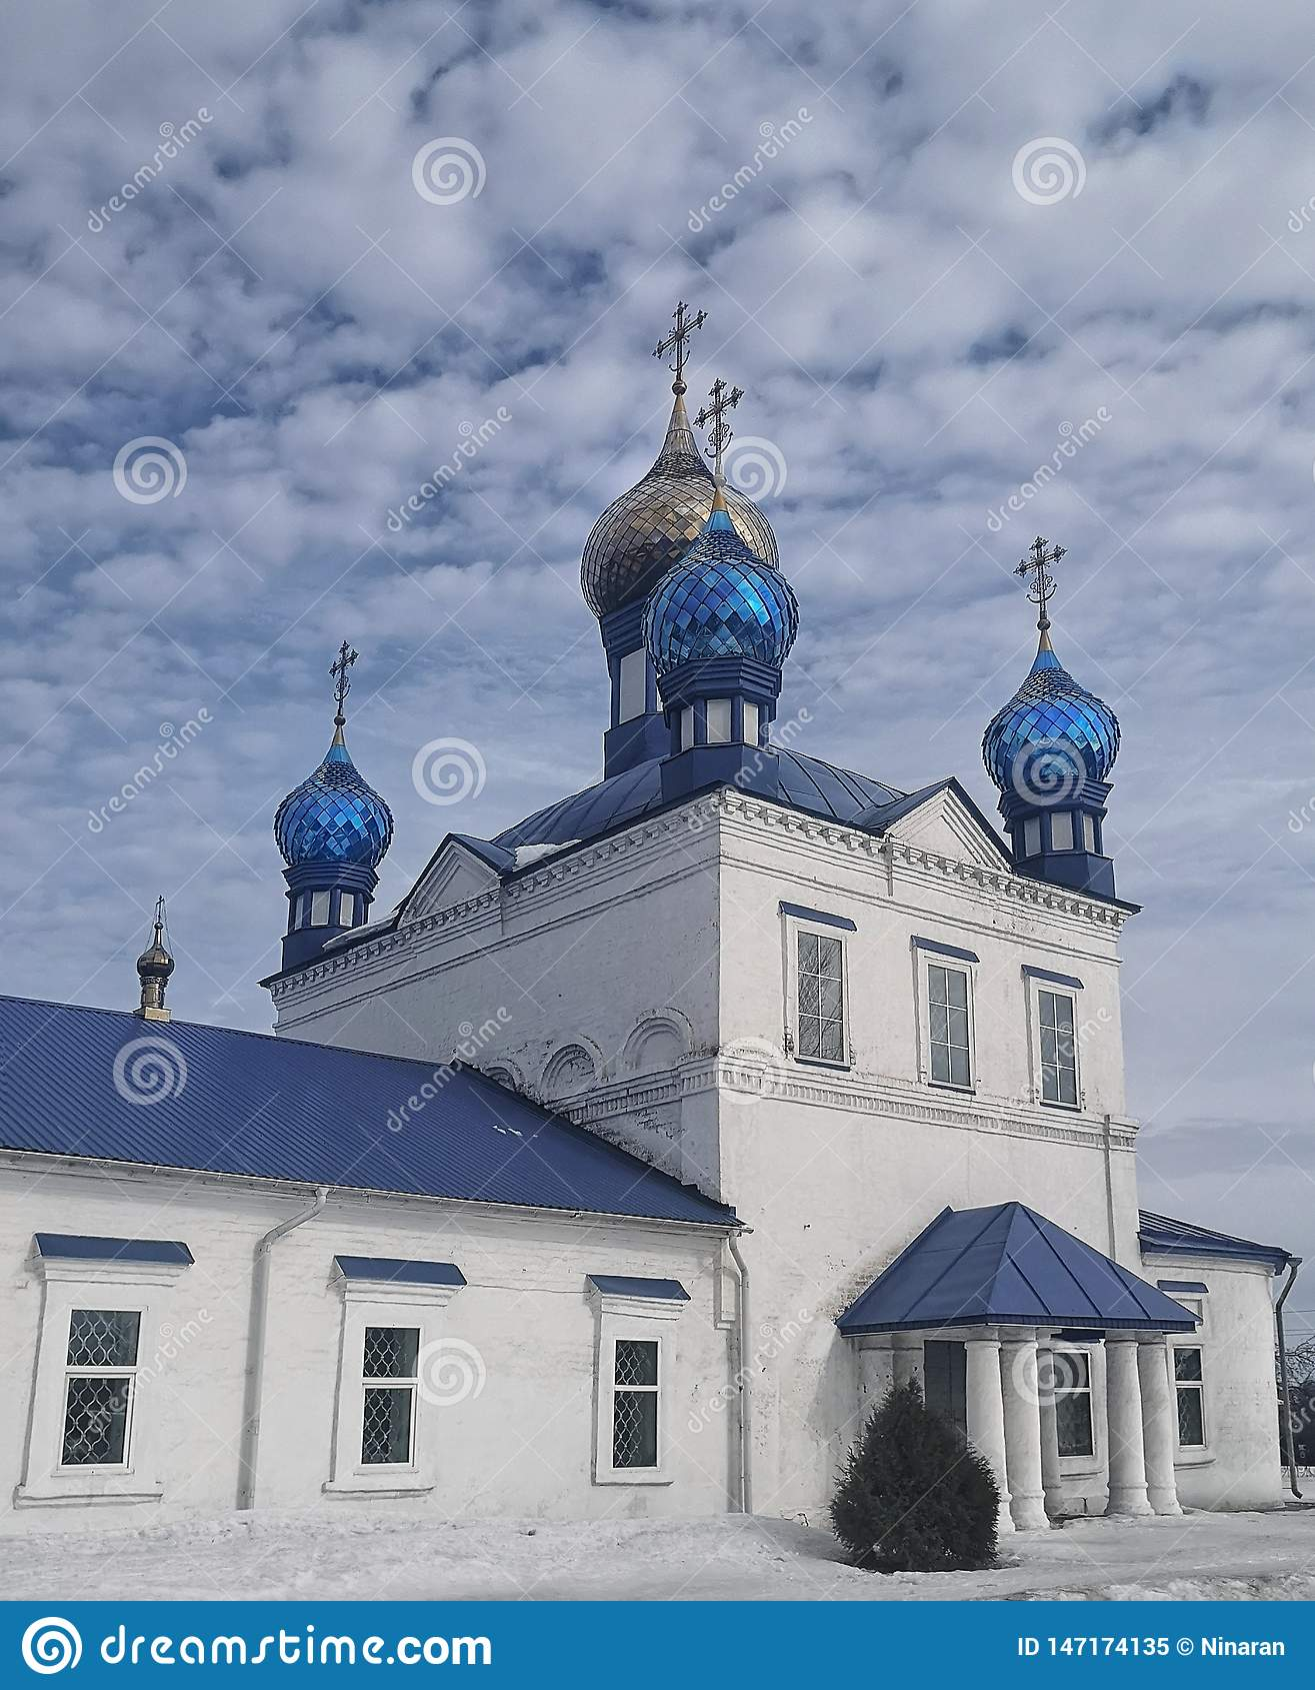 Cristian Church was built in 1708, Russia